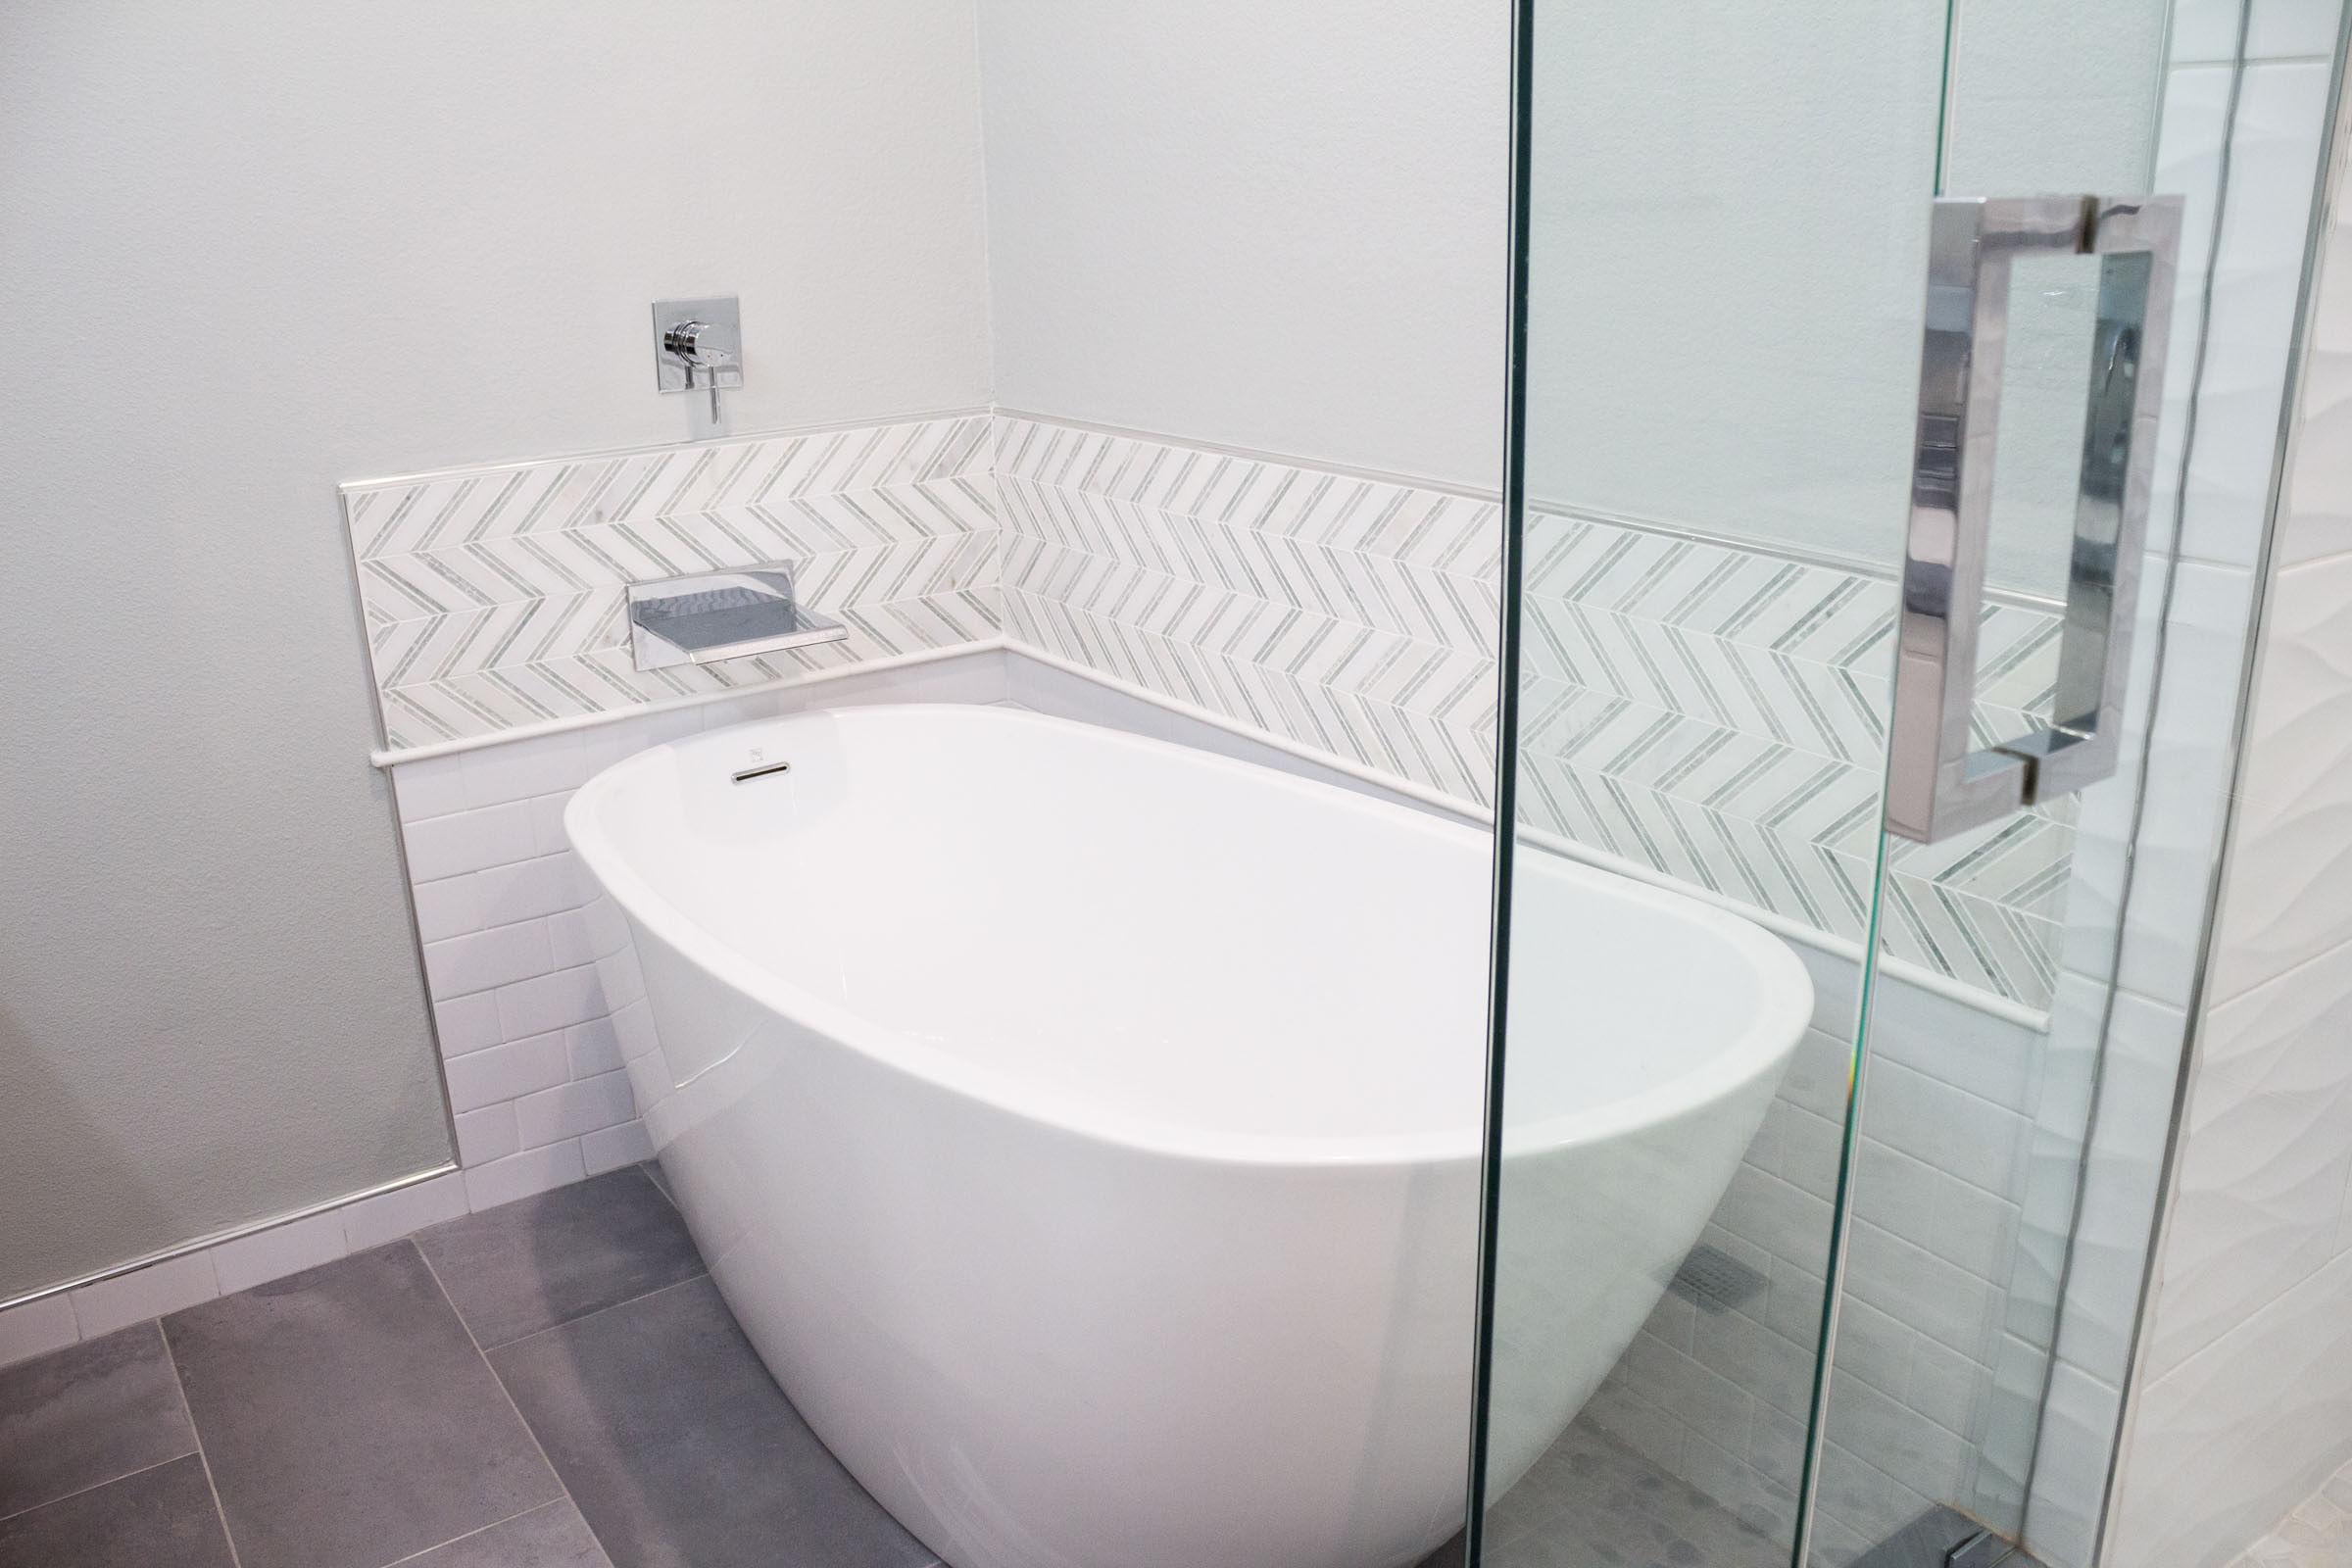 Bathroom remodel with white pedestal tub, chevron backsplash, grey tile, and chrome waterfall faucet